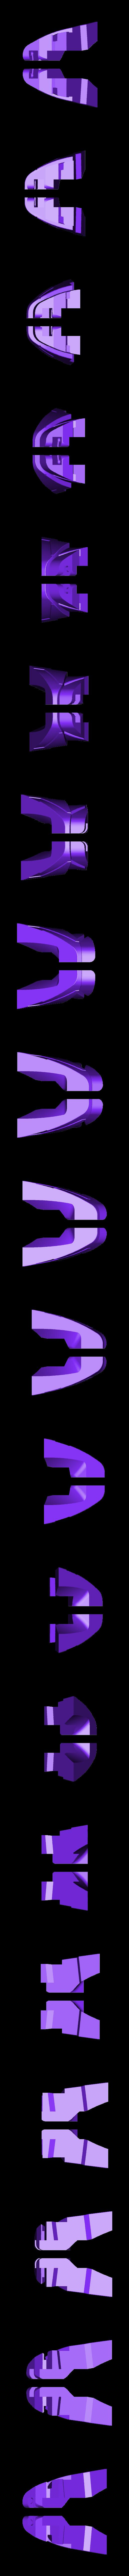 31_Drag_Waist4_Side1_GREY.stl Download STL file ARTICULATED DRAGONLORD (not Dragonzord) - NO SUPPORT • 3D printer model, Toymakr3D